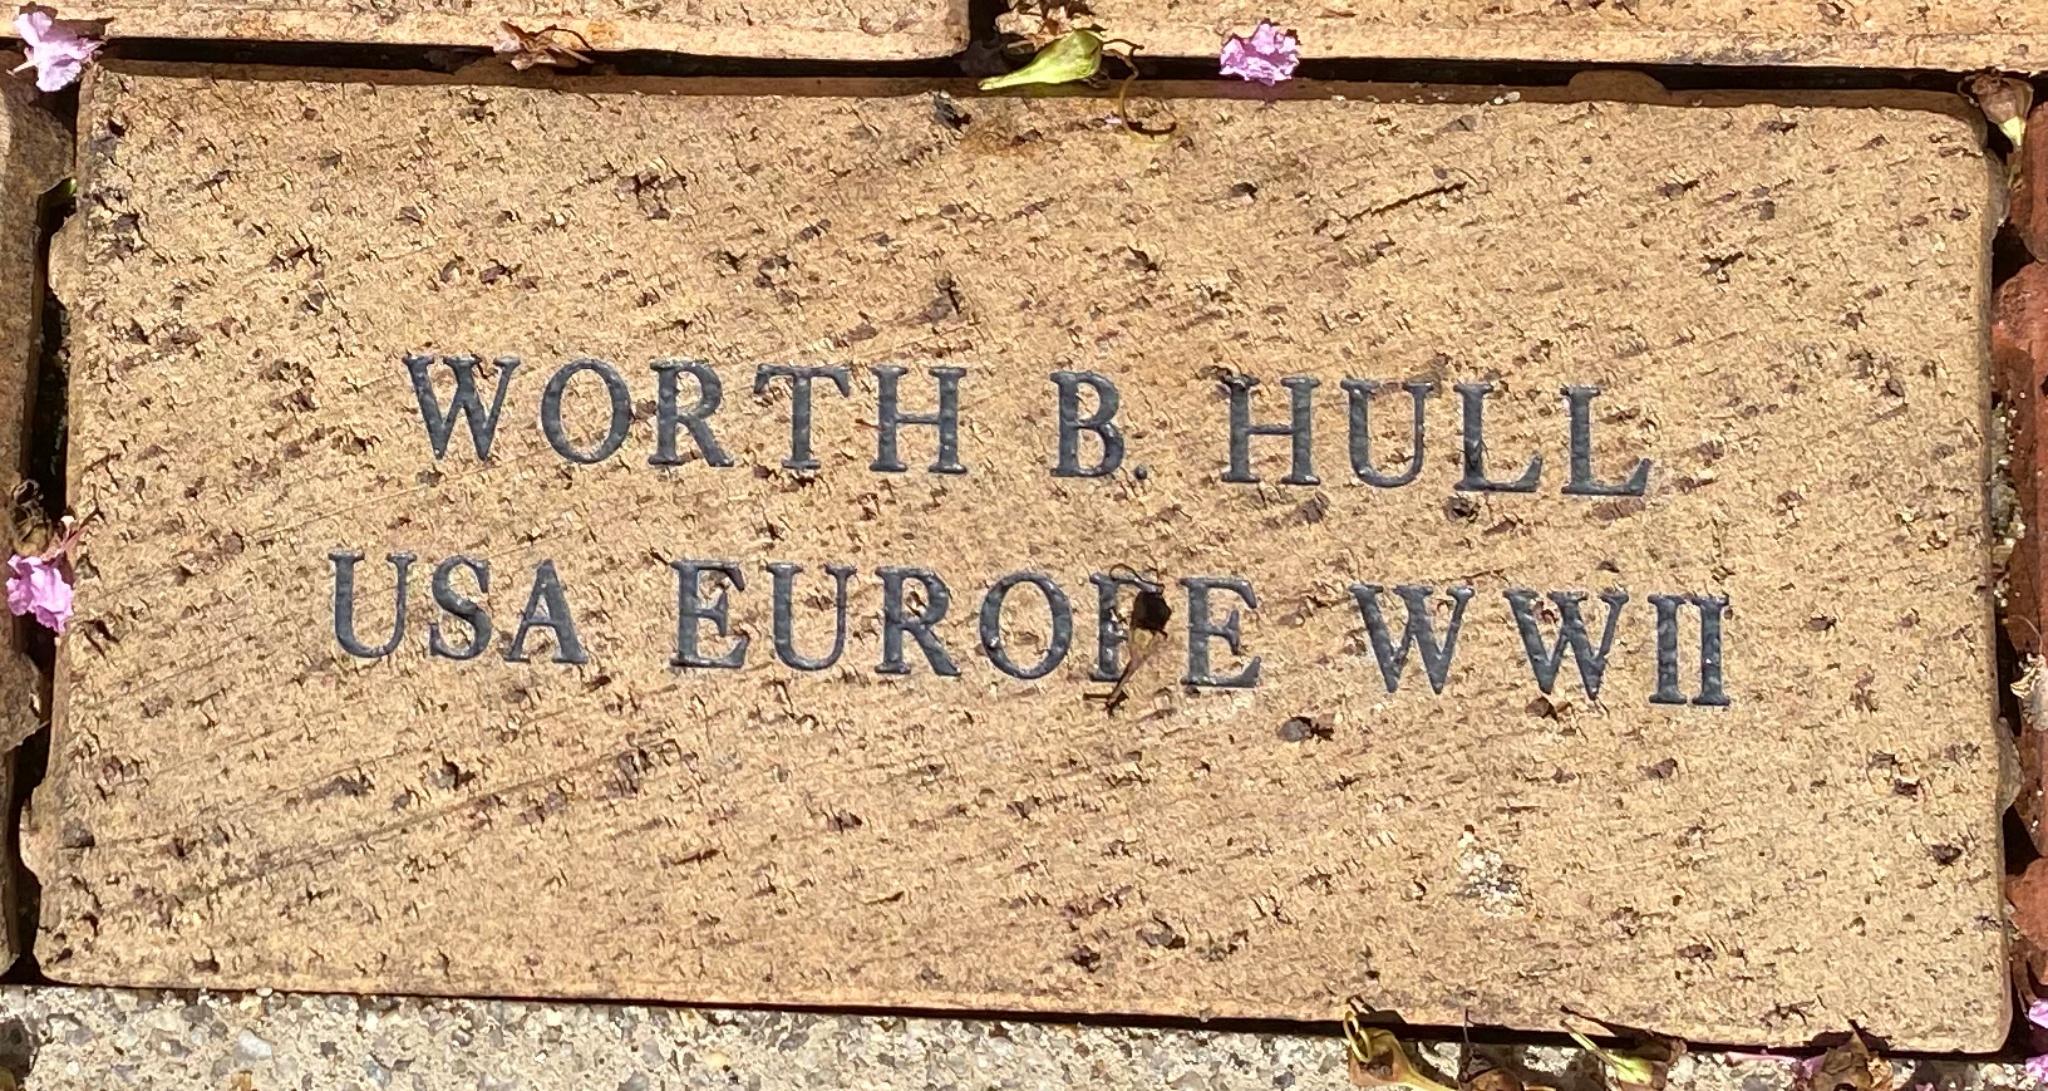 WORTH B HULL USA EUROPE WWII